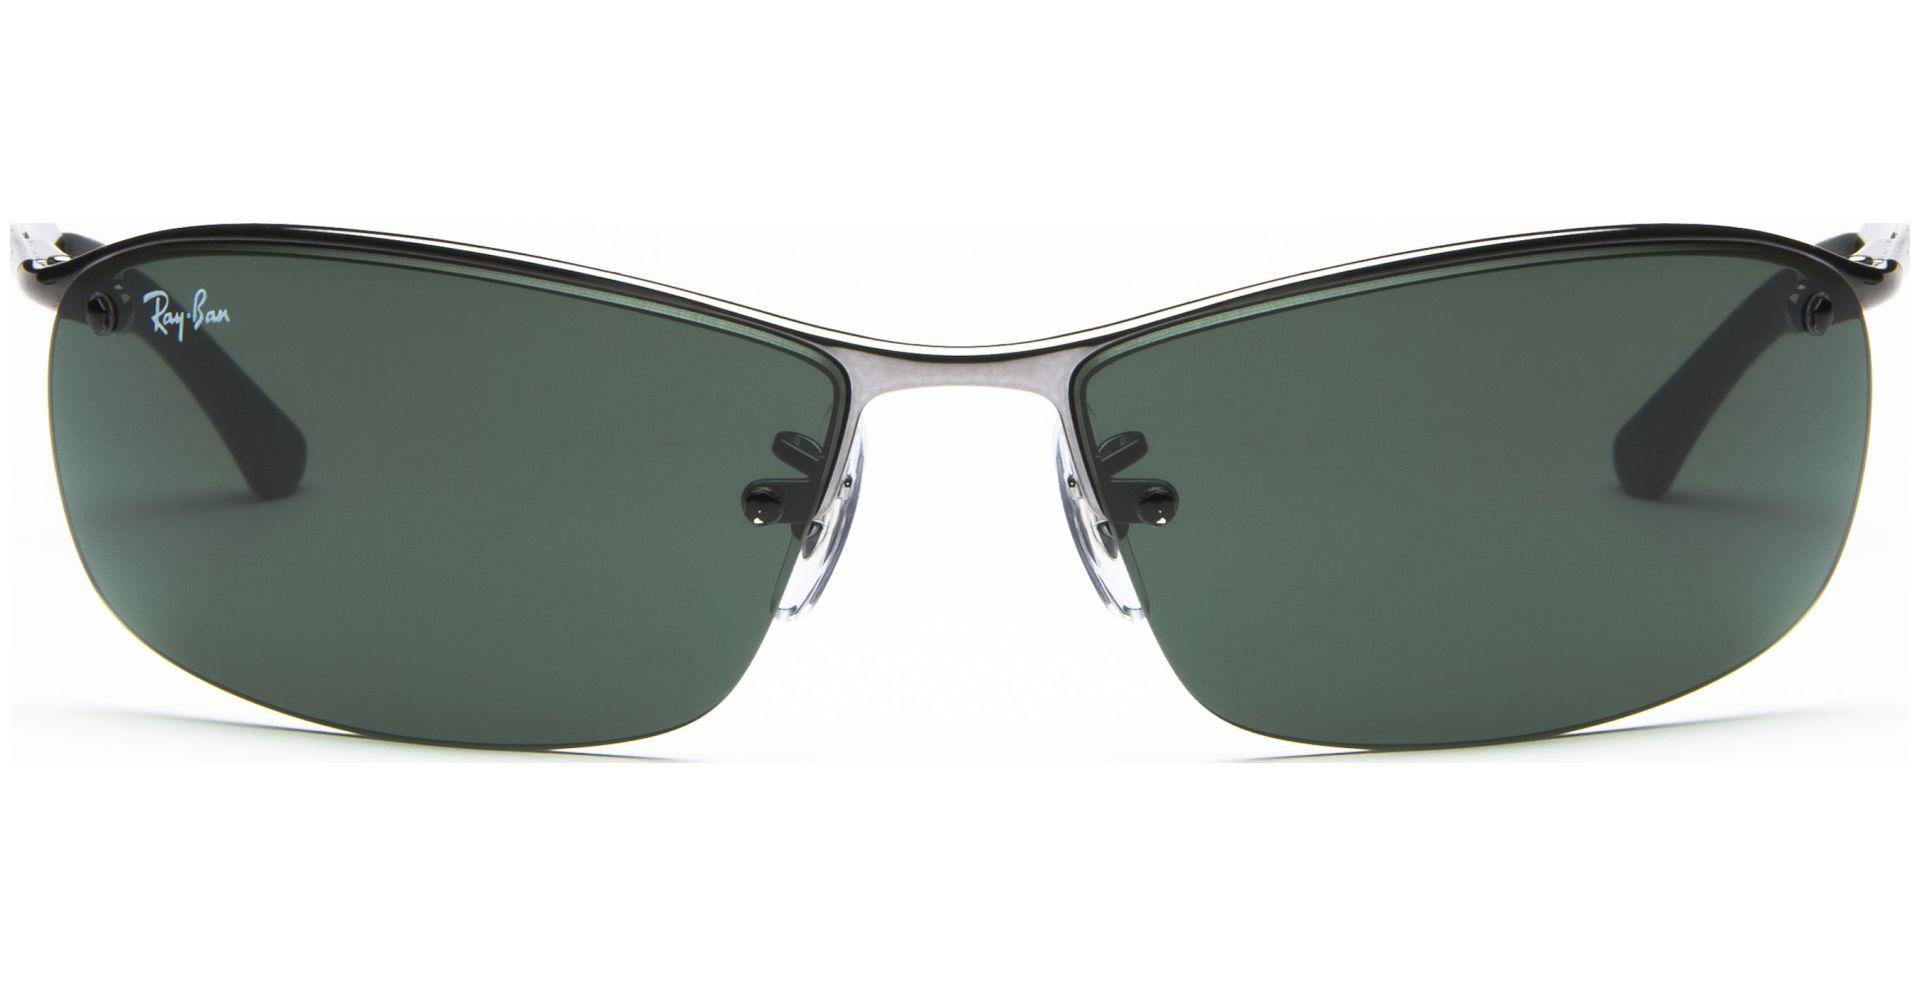 Ray-Ban Top Bar 3183 004/71 6315 Gunmetal/Green | Lensbest